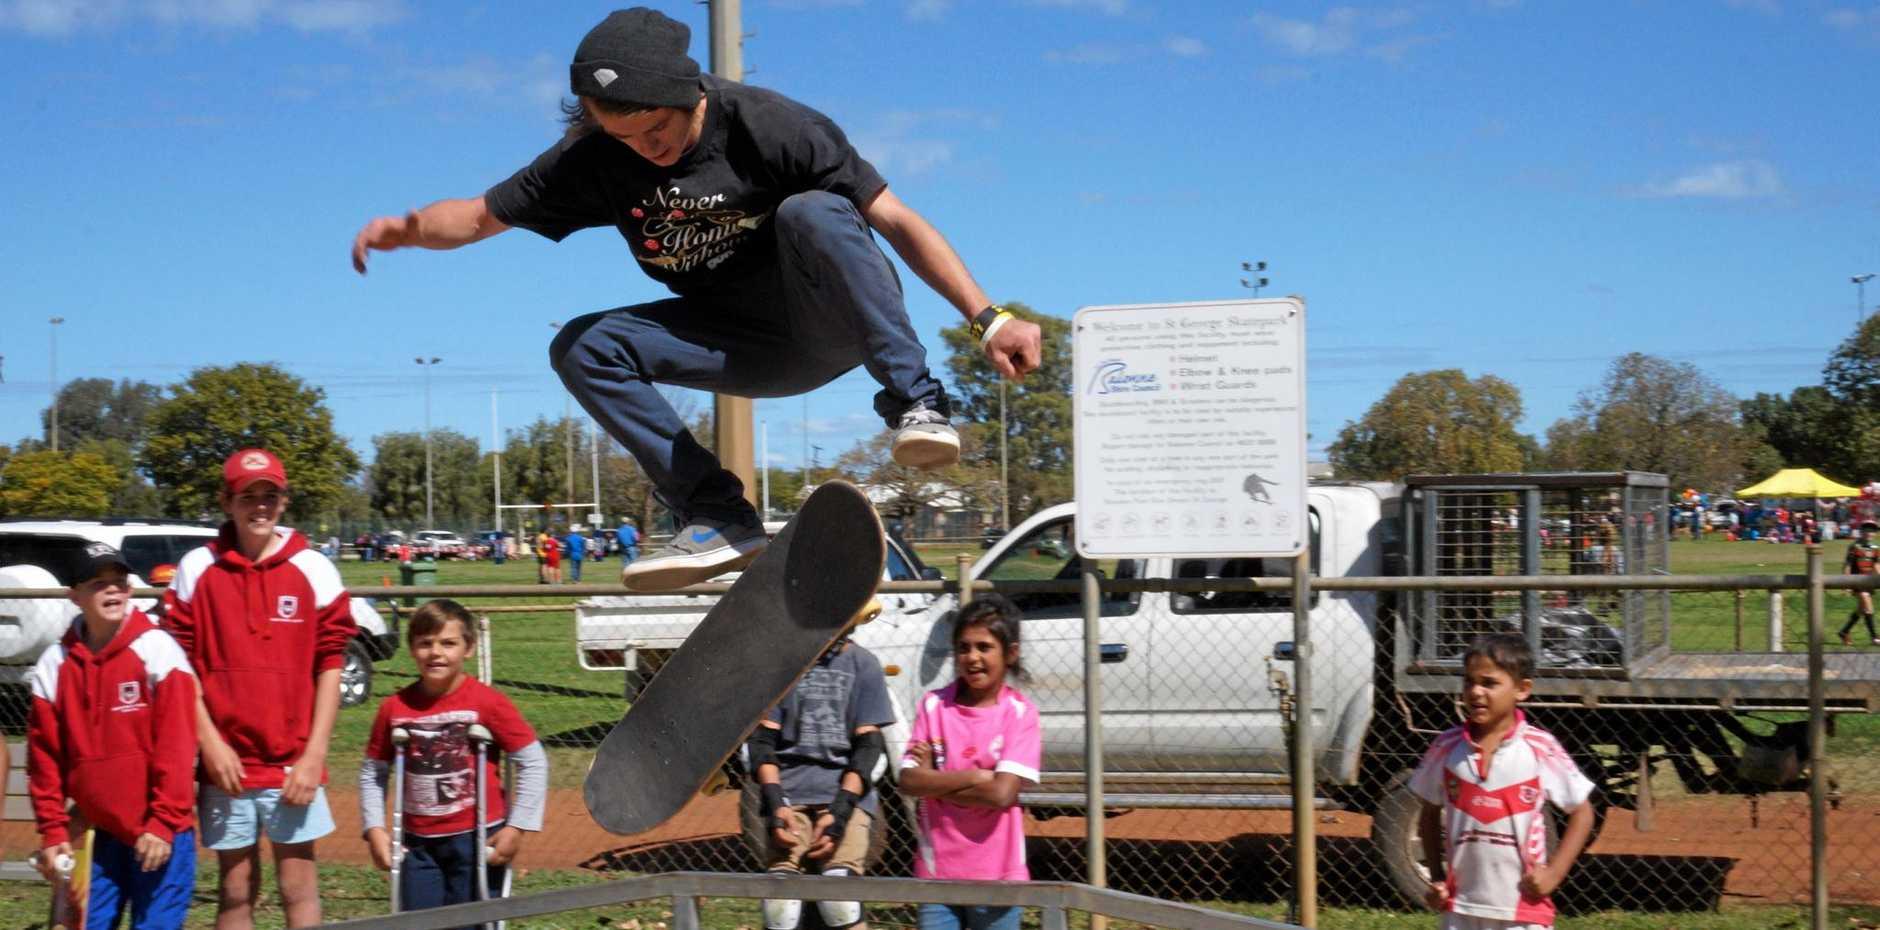 FLIP IT: The Skateboard Revolutions Workshop team showing their skills.